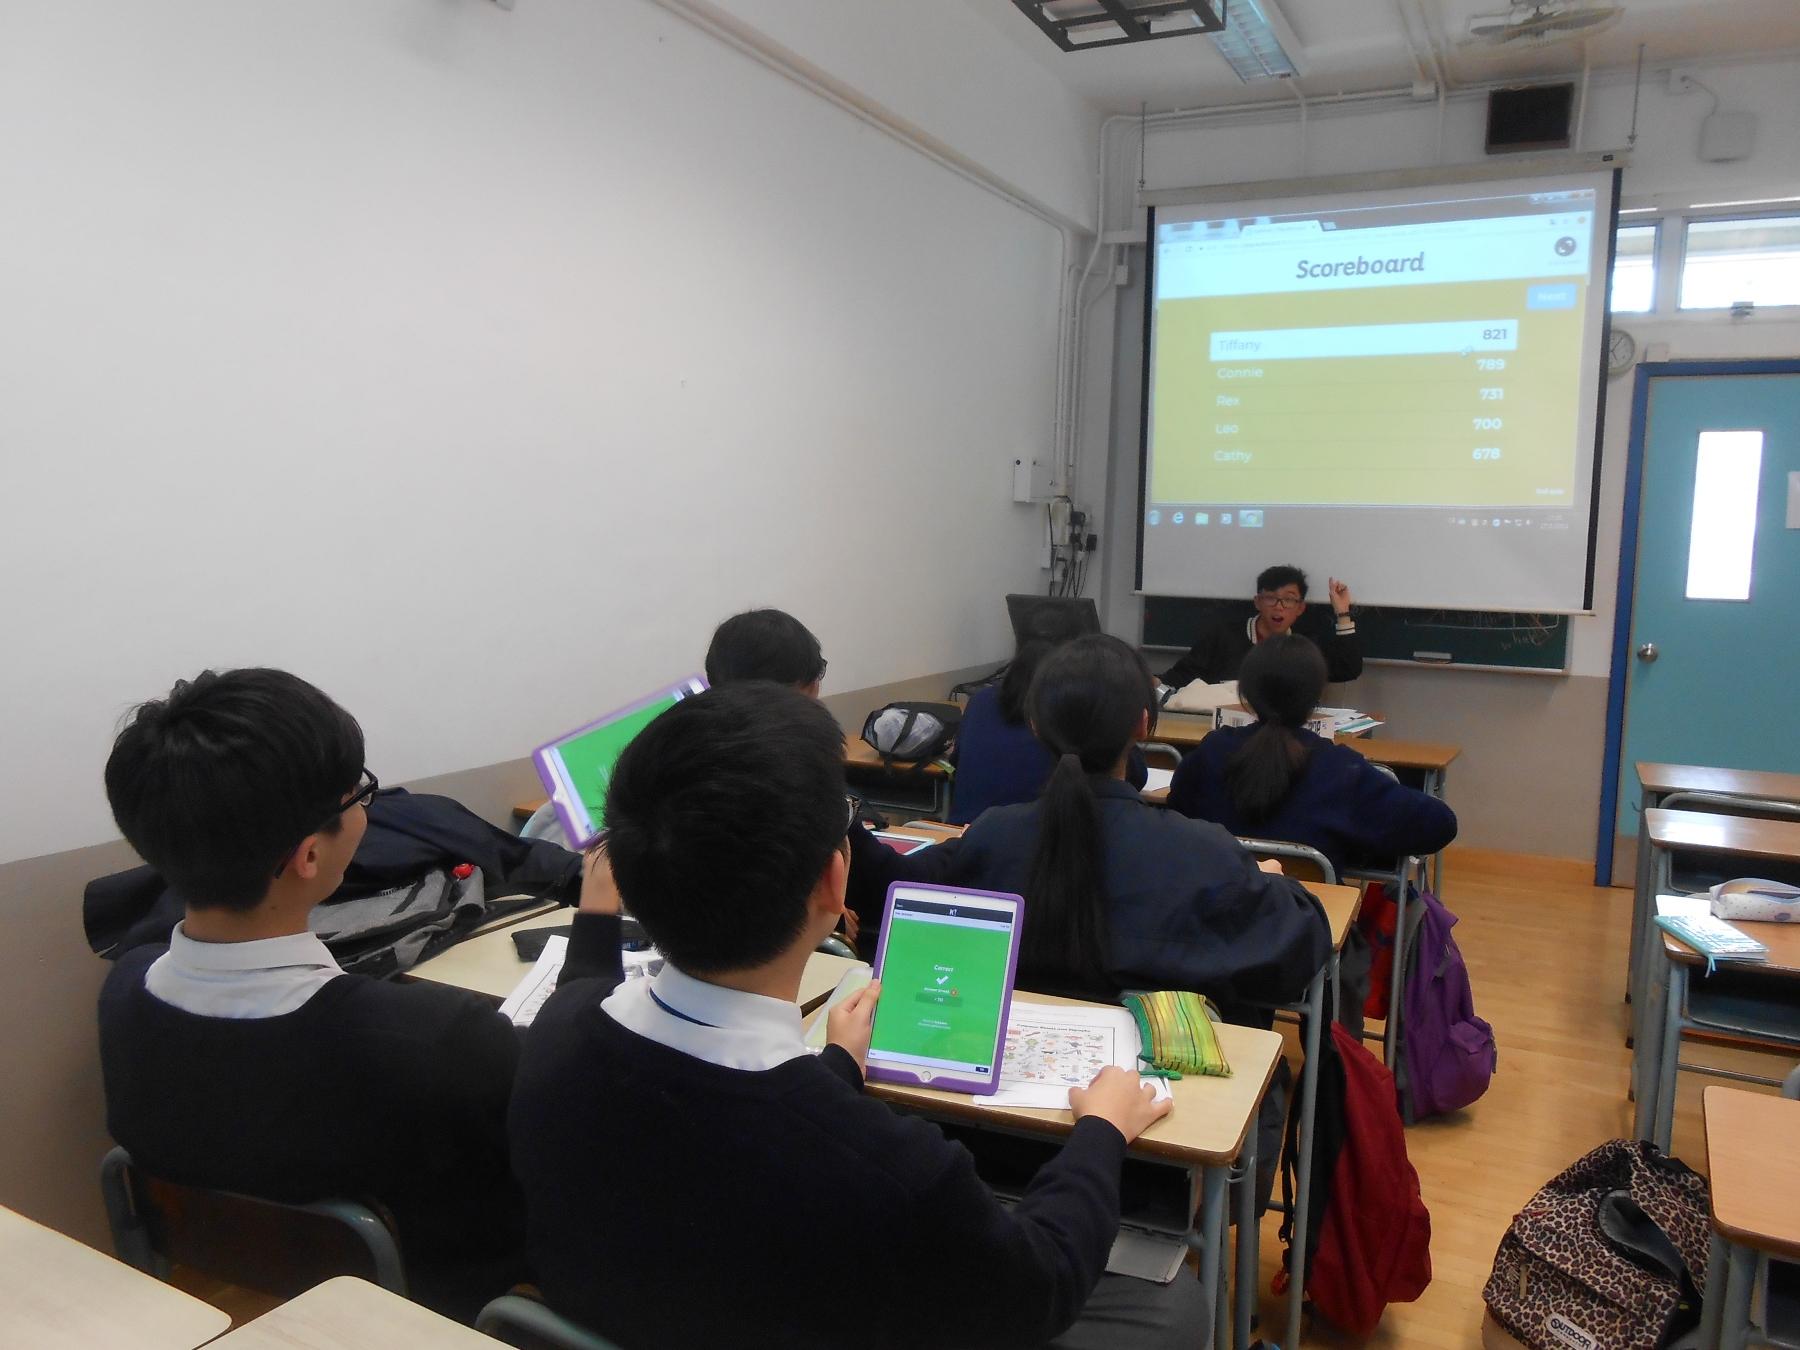 http://npc.edu.hk/sites/default/files/dscn9593.jpg